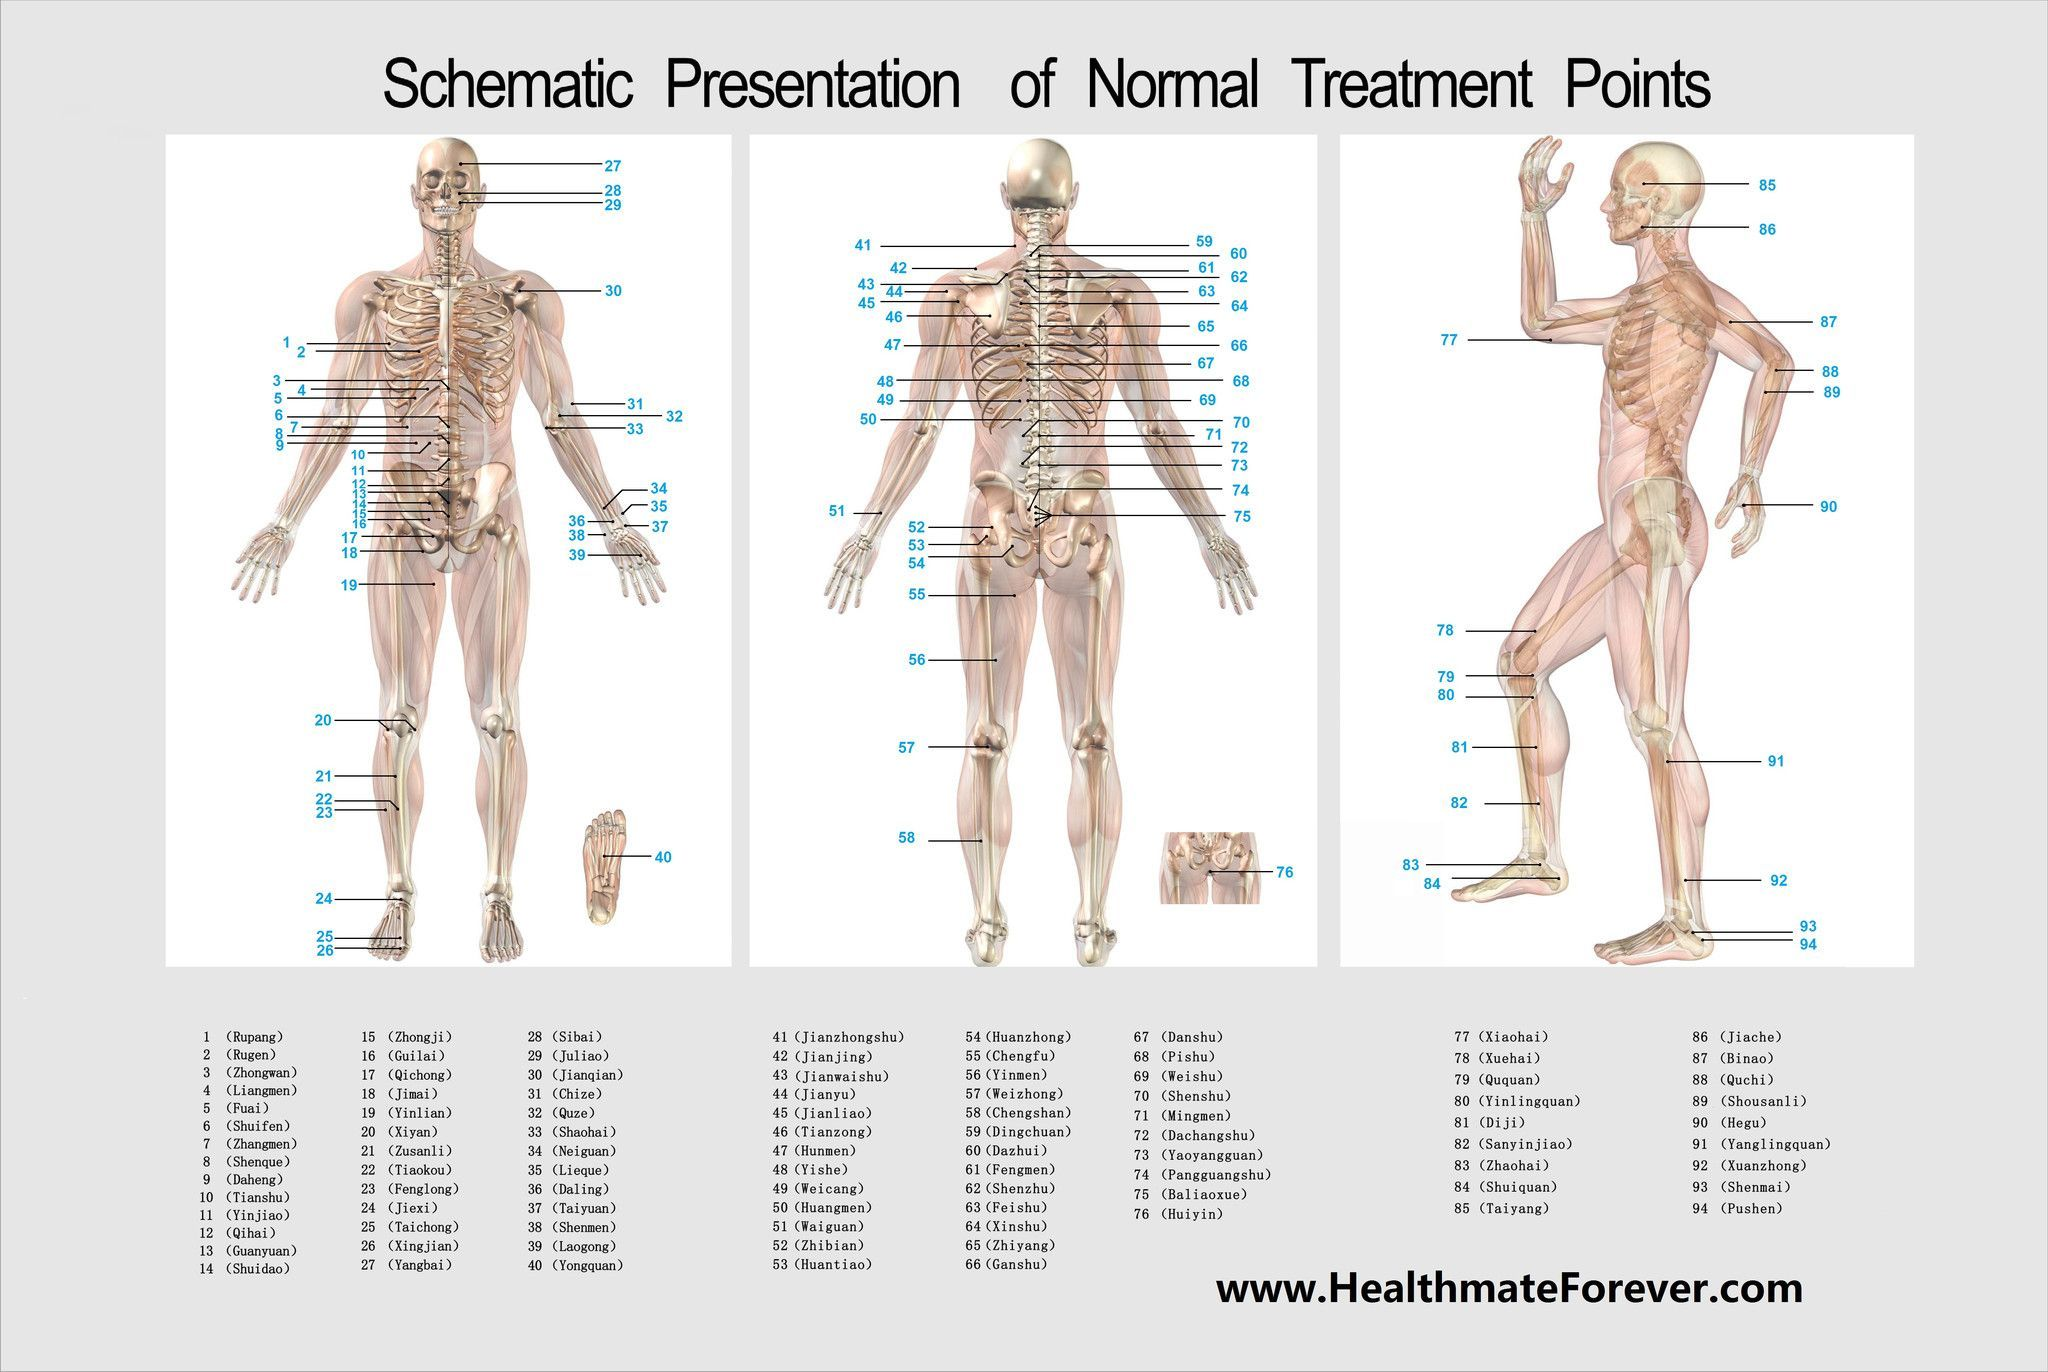 Healthmateforever Acupunture Chart Healthmateforever International Llc Tens Units Electrical M Healthmateforever Electronic Pulse Massager Pulse Massager